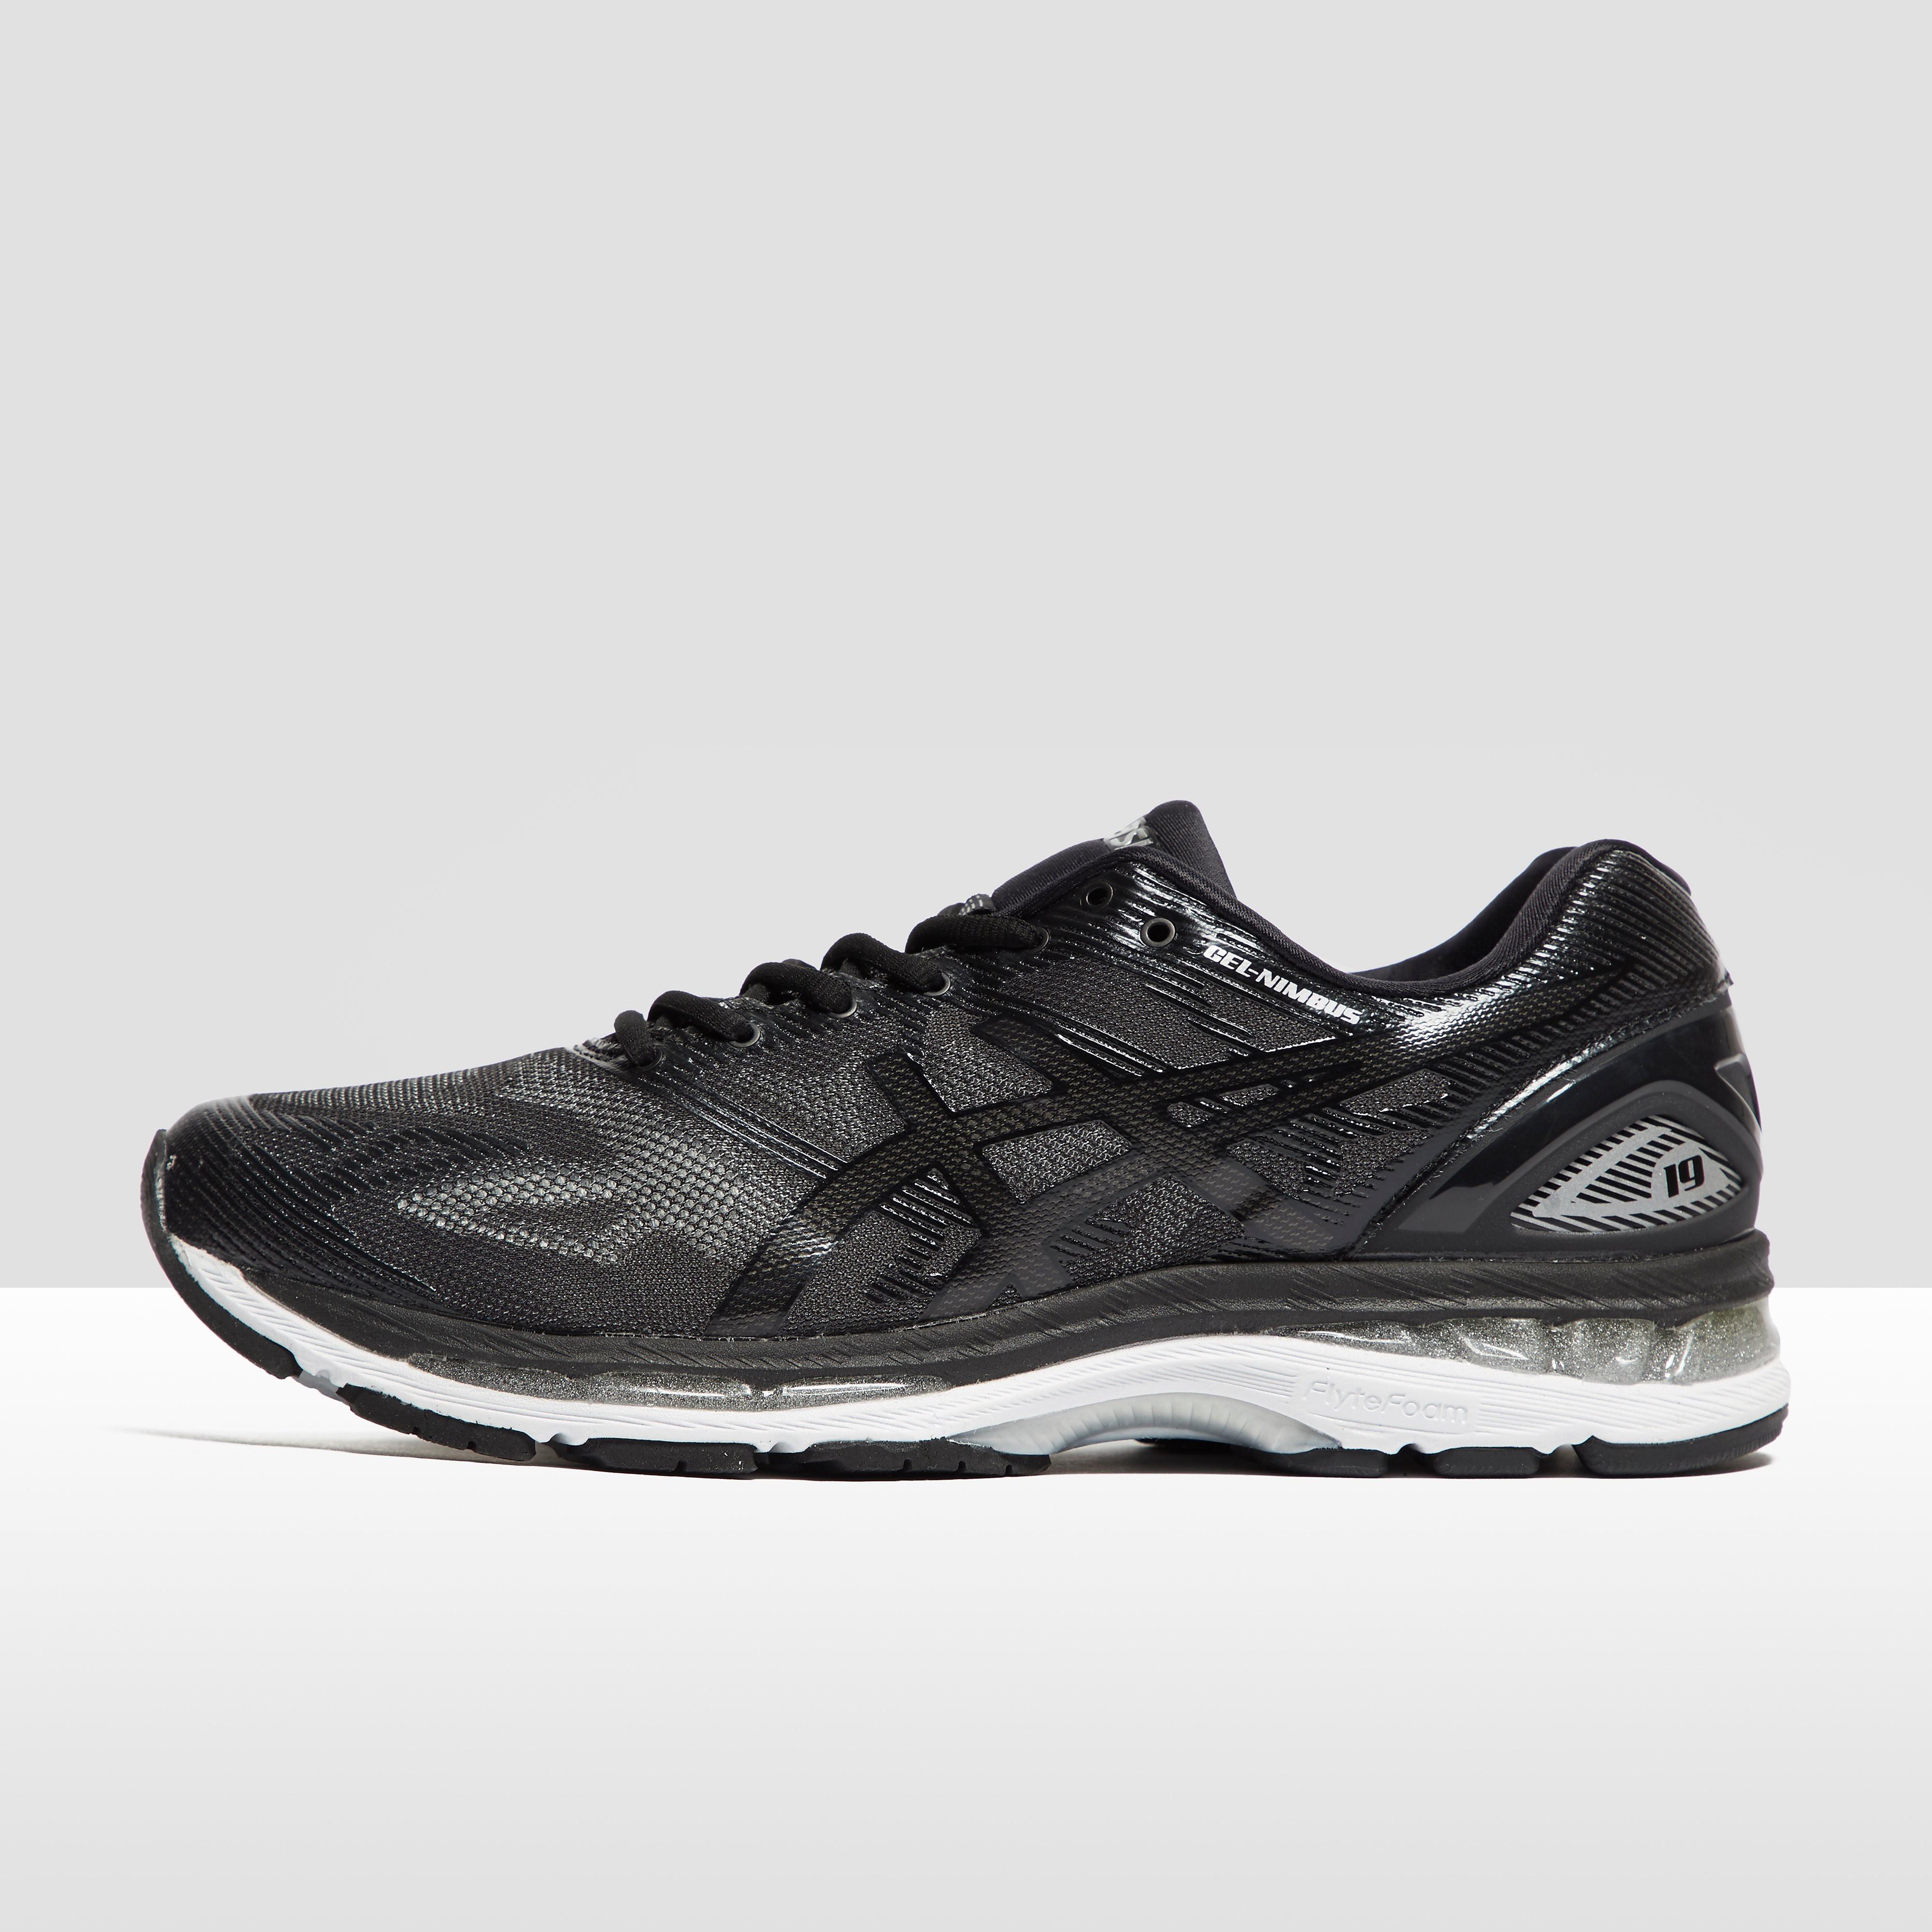 Men's ASICS Gel-Nimbus 19 Running Shoes - Black/White, Black